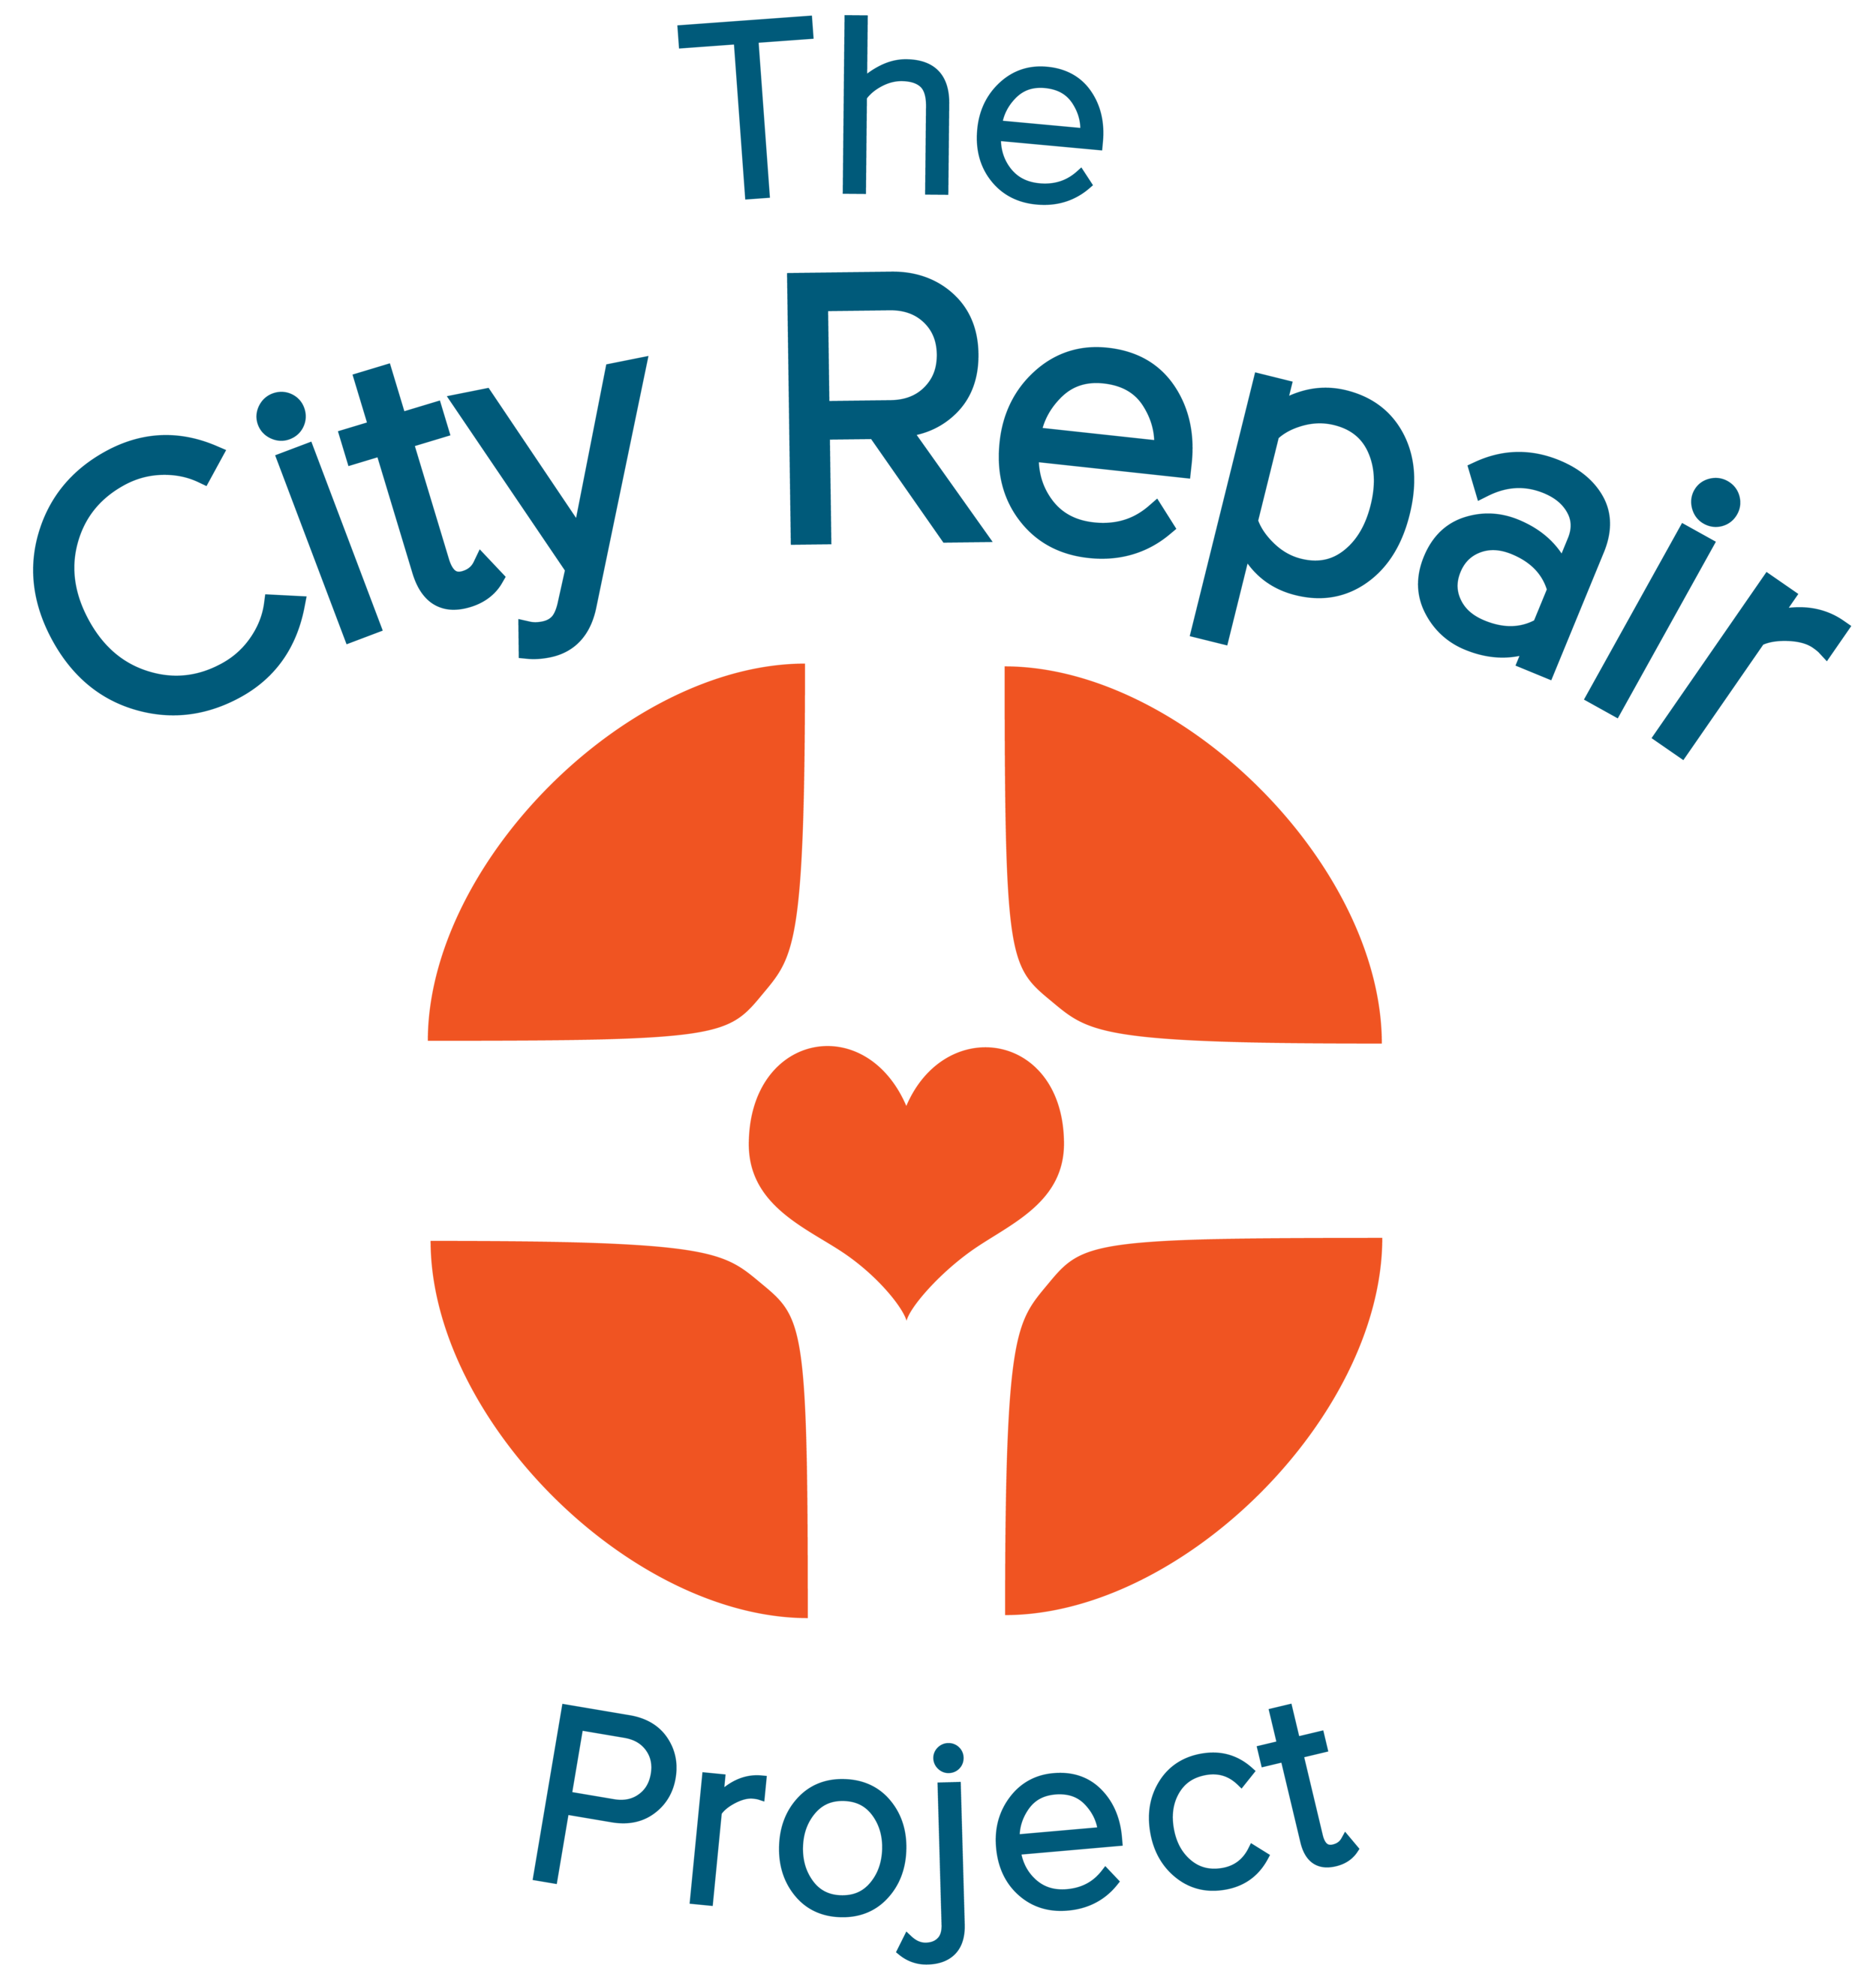 CR Logo_RoundText_Vector_orange+blue_15.05.10.jpg.png